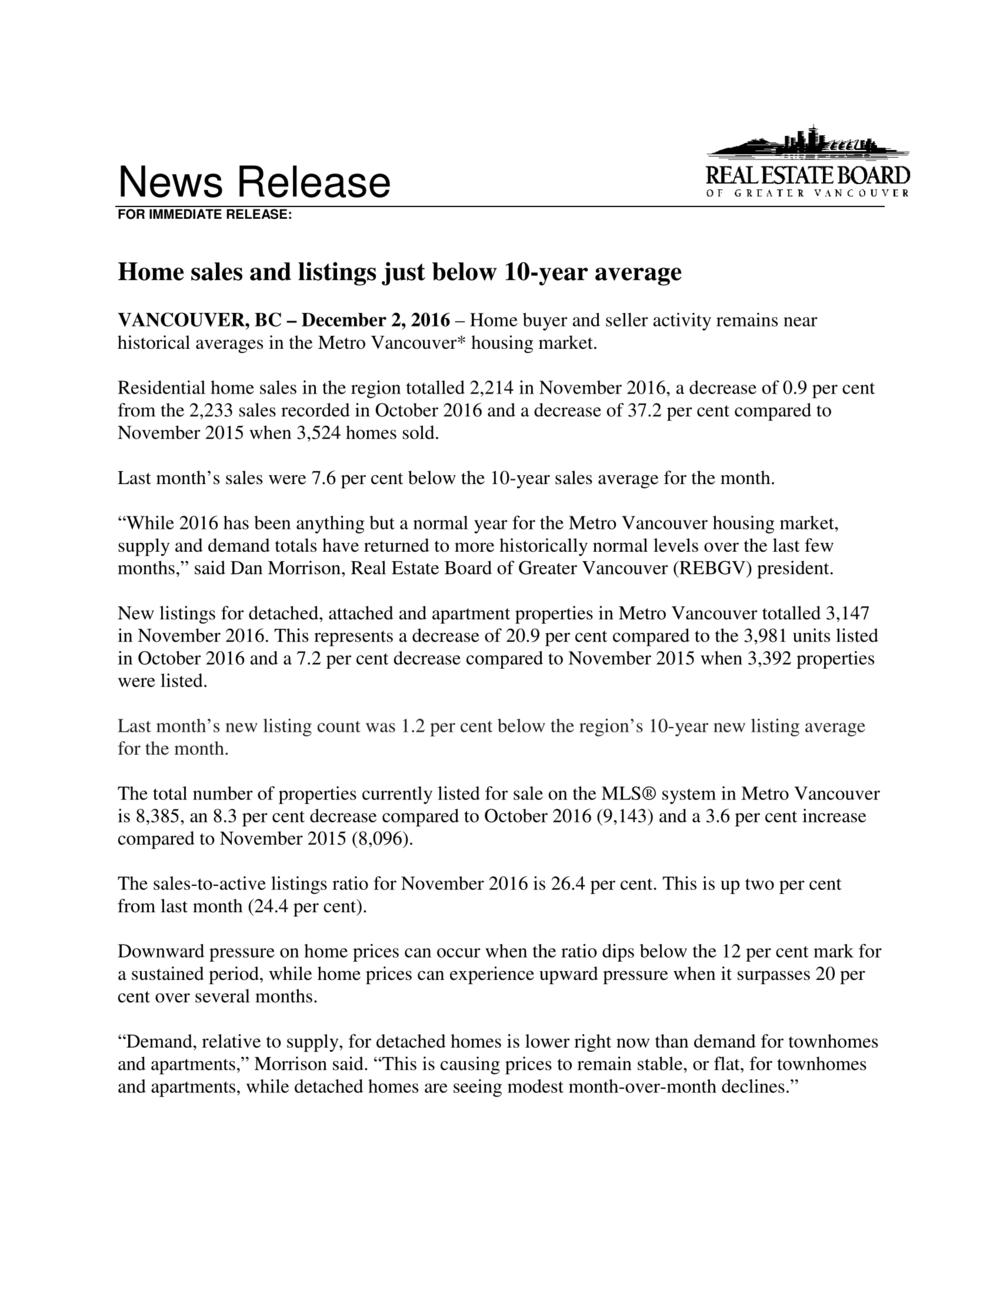 REBGV Stats Package November 2016-1.png